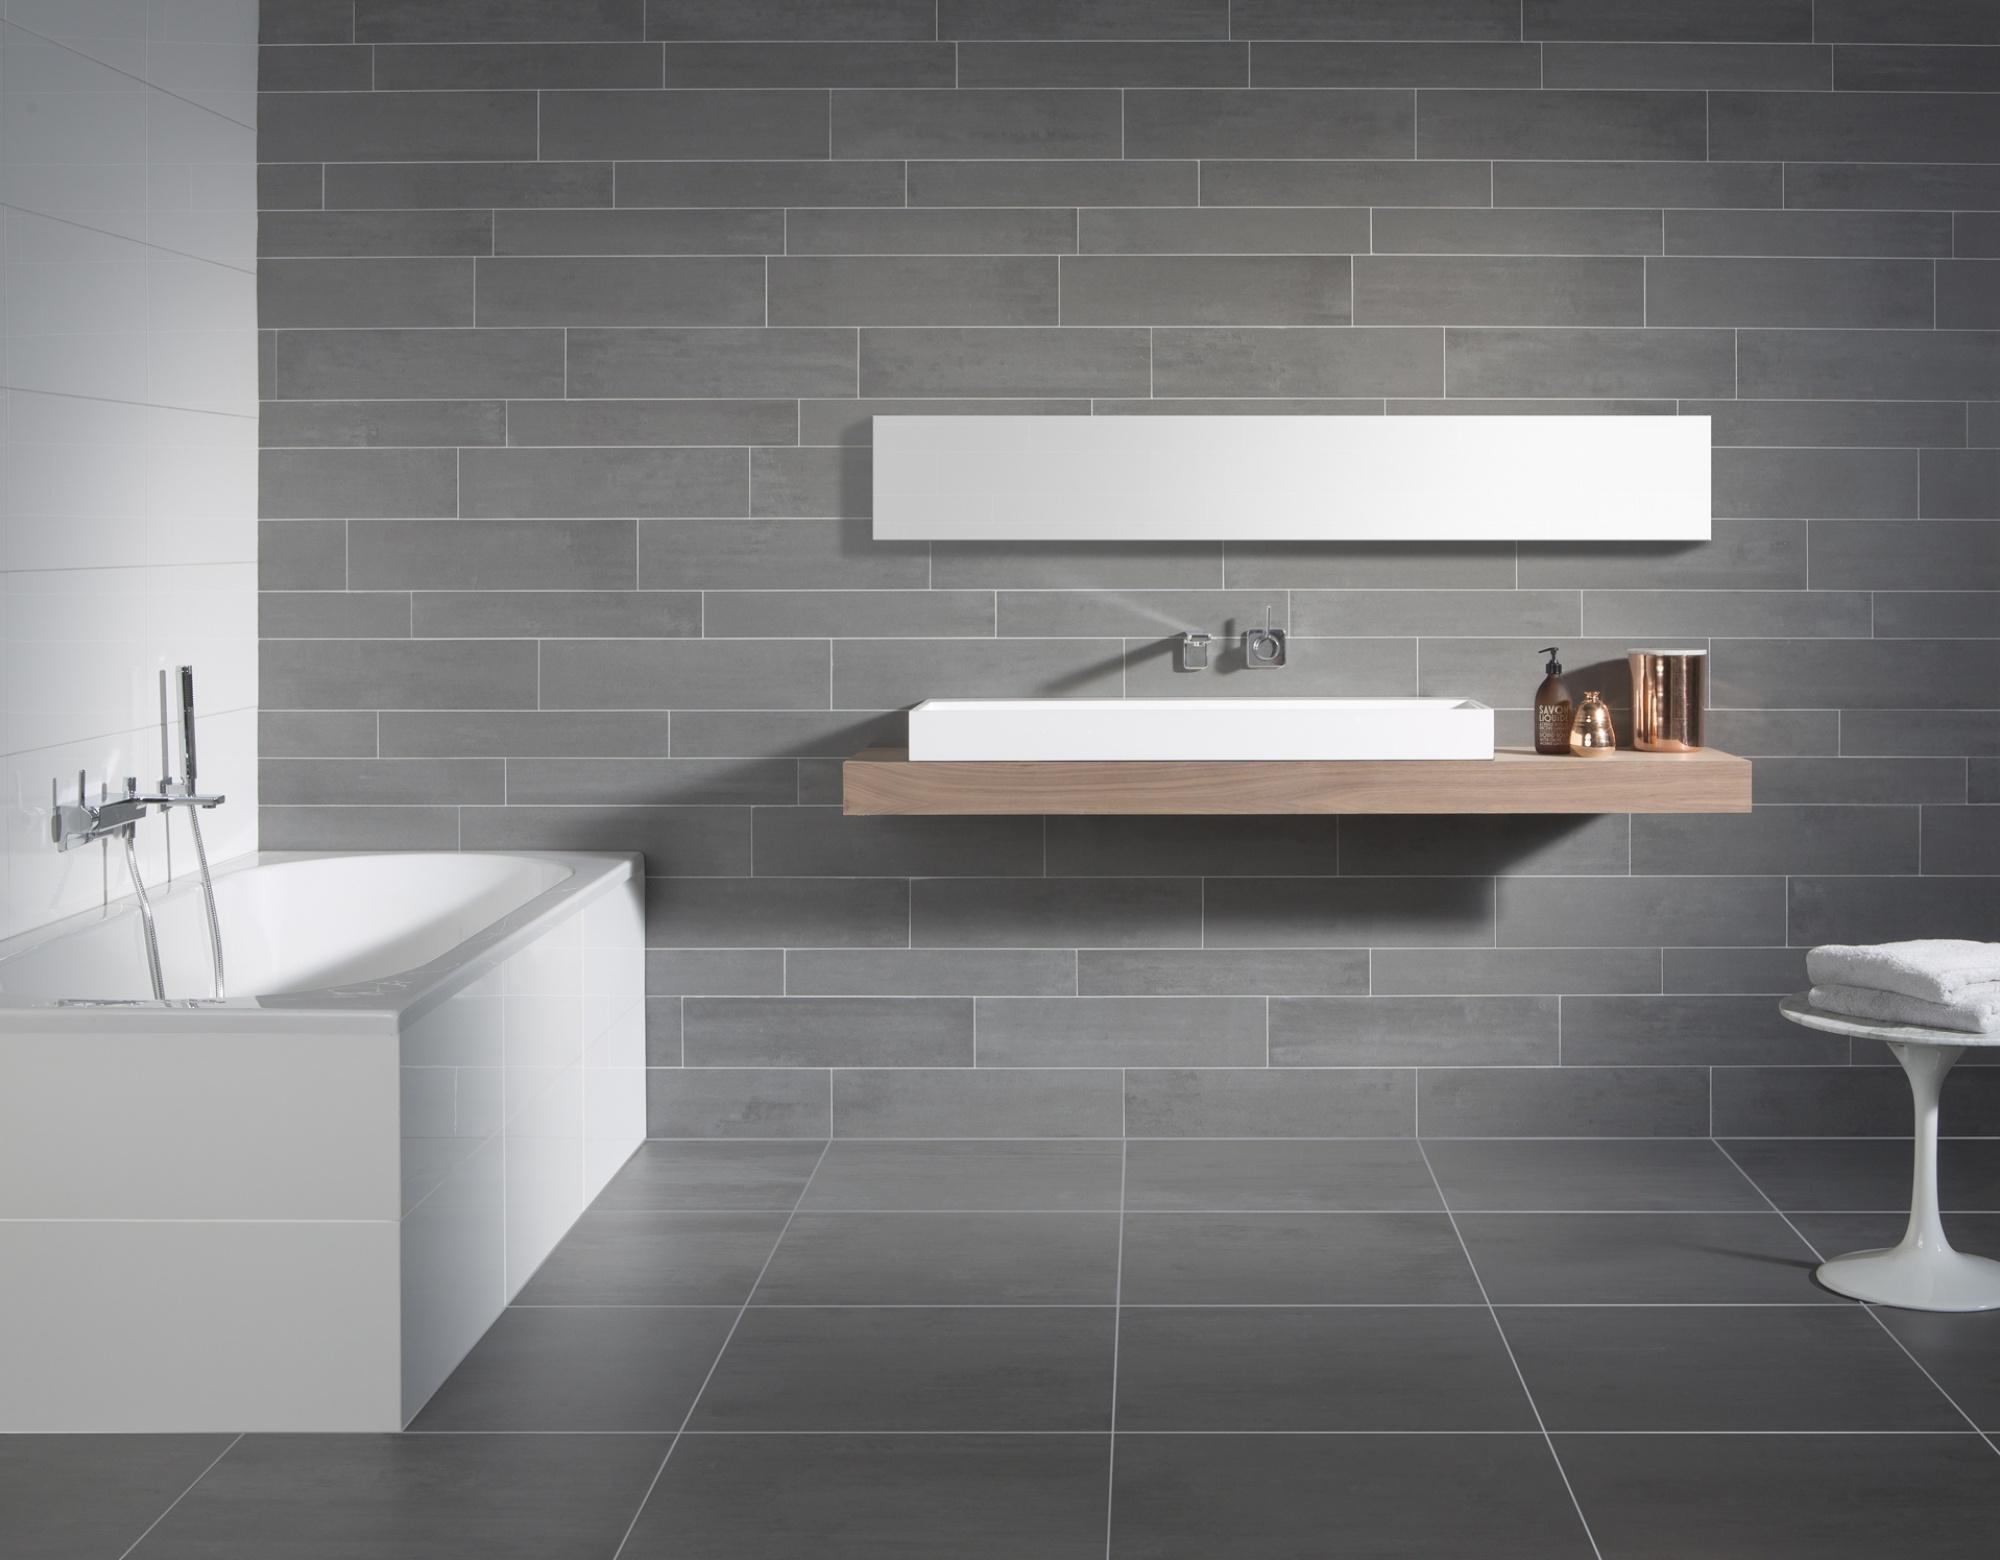 Vloertegels Badkamer Mosa : Residential u e mosa tegels